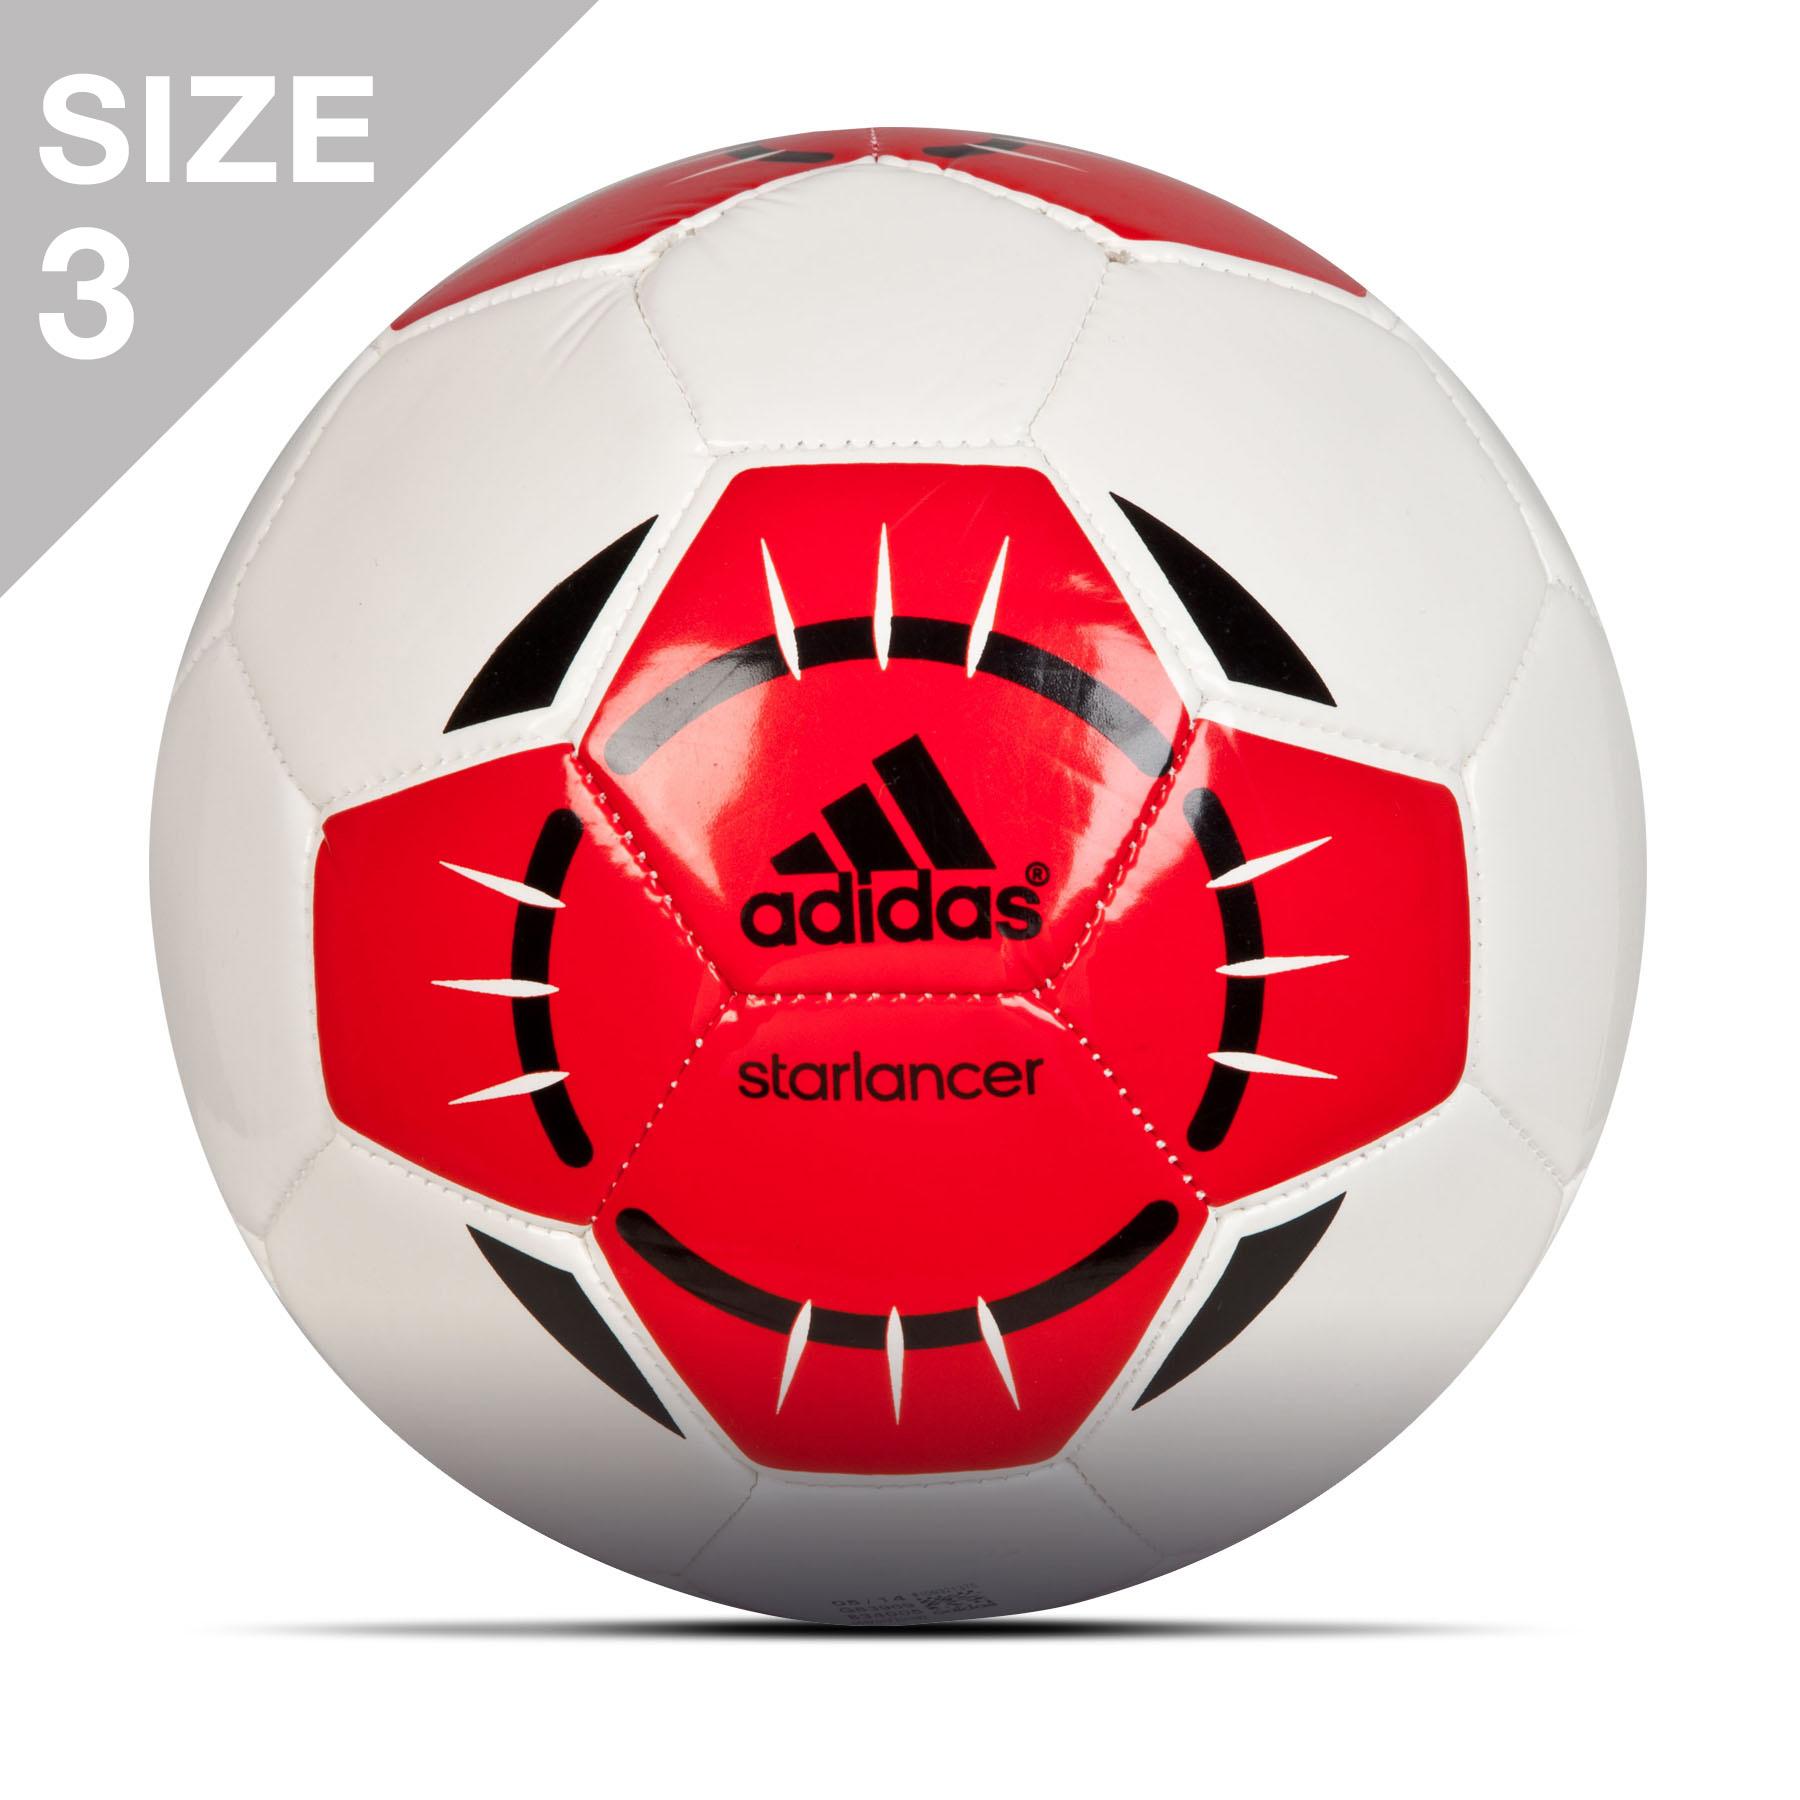 Adidas Starlancer Football - Size 3